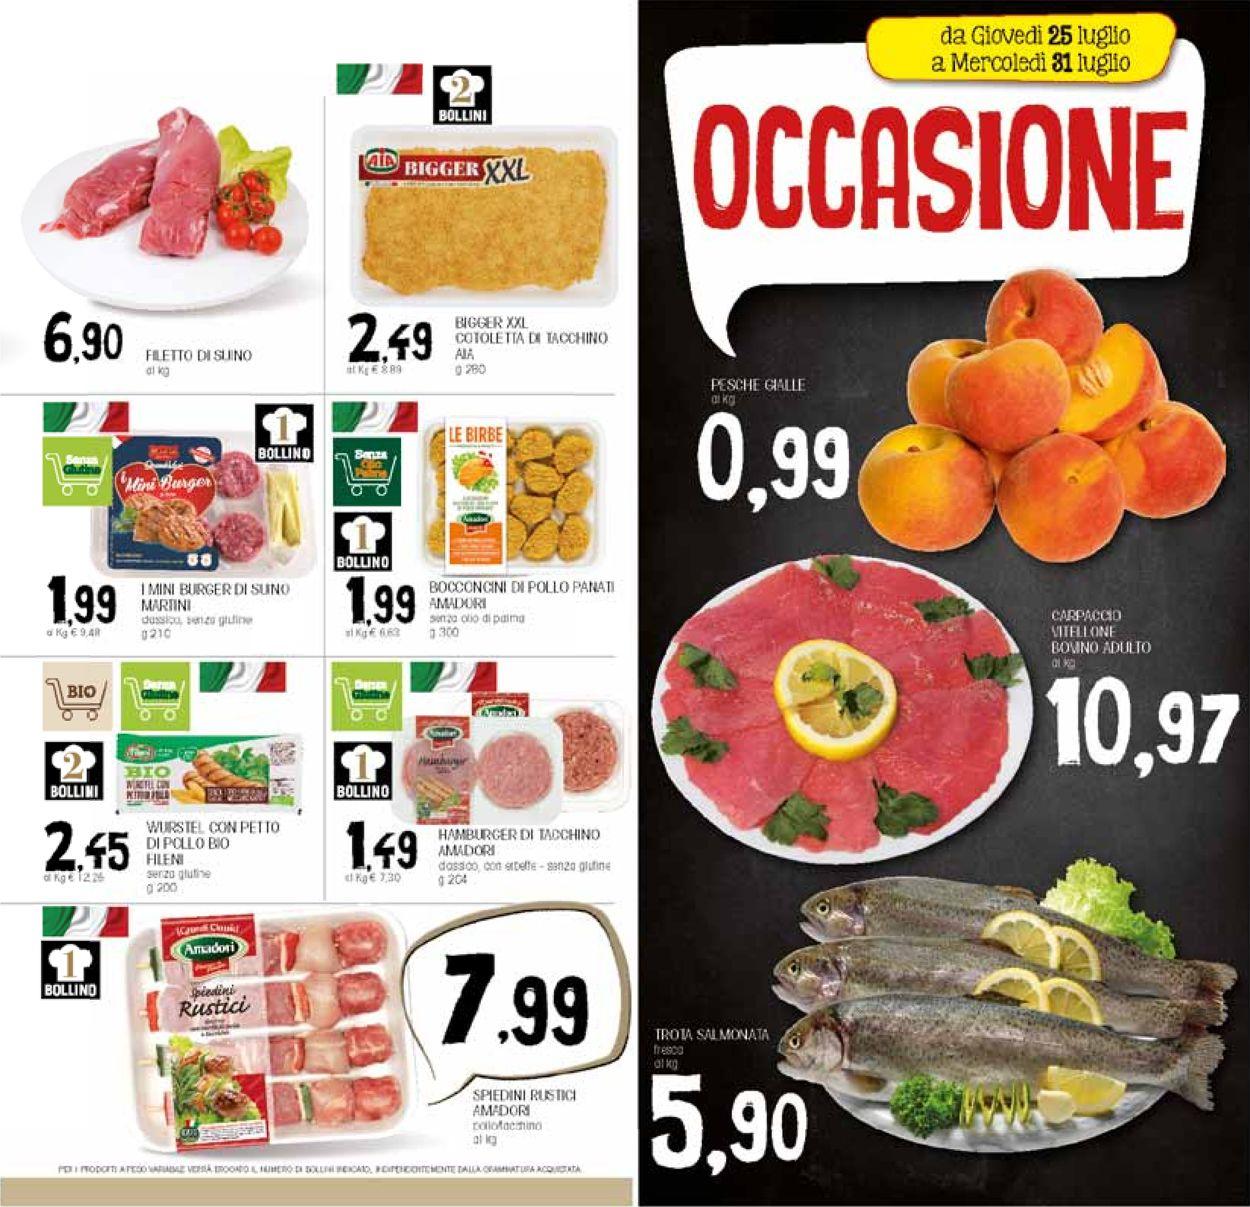 Volantino Famila - Offerte 25/07-07/08/2019 (Pagina 3)